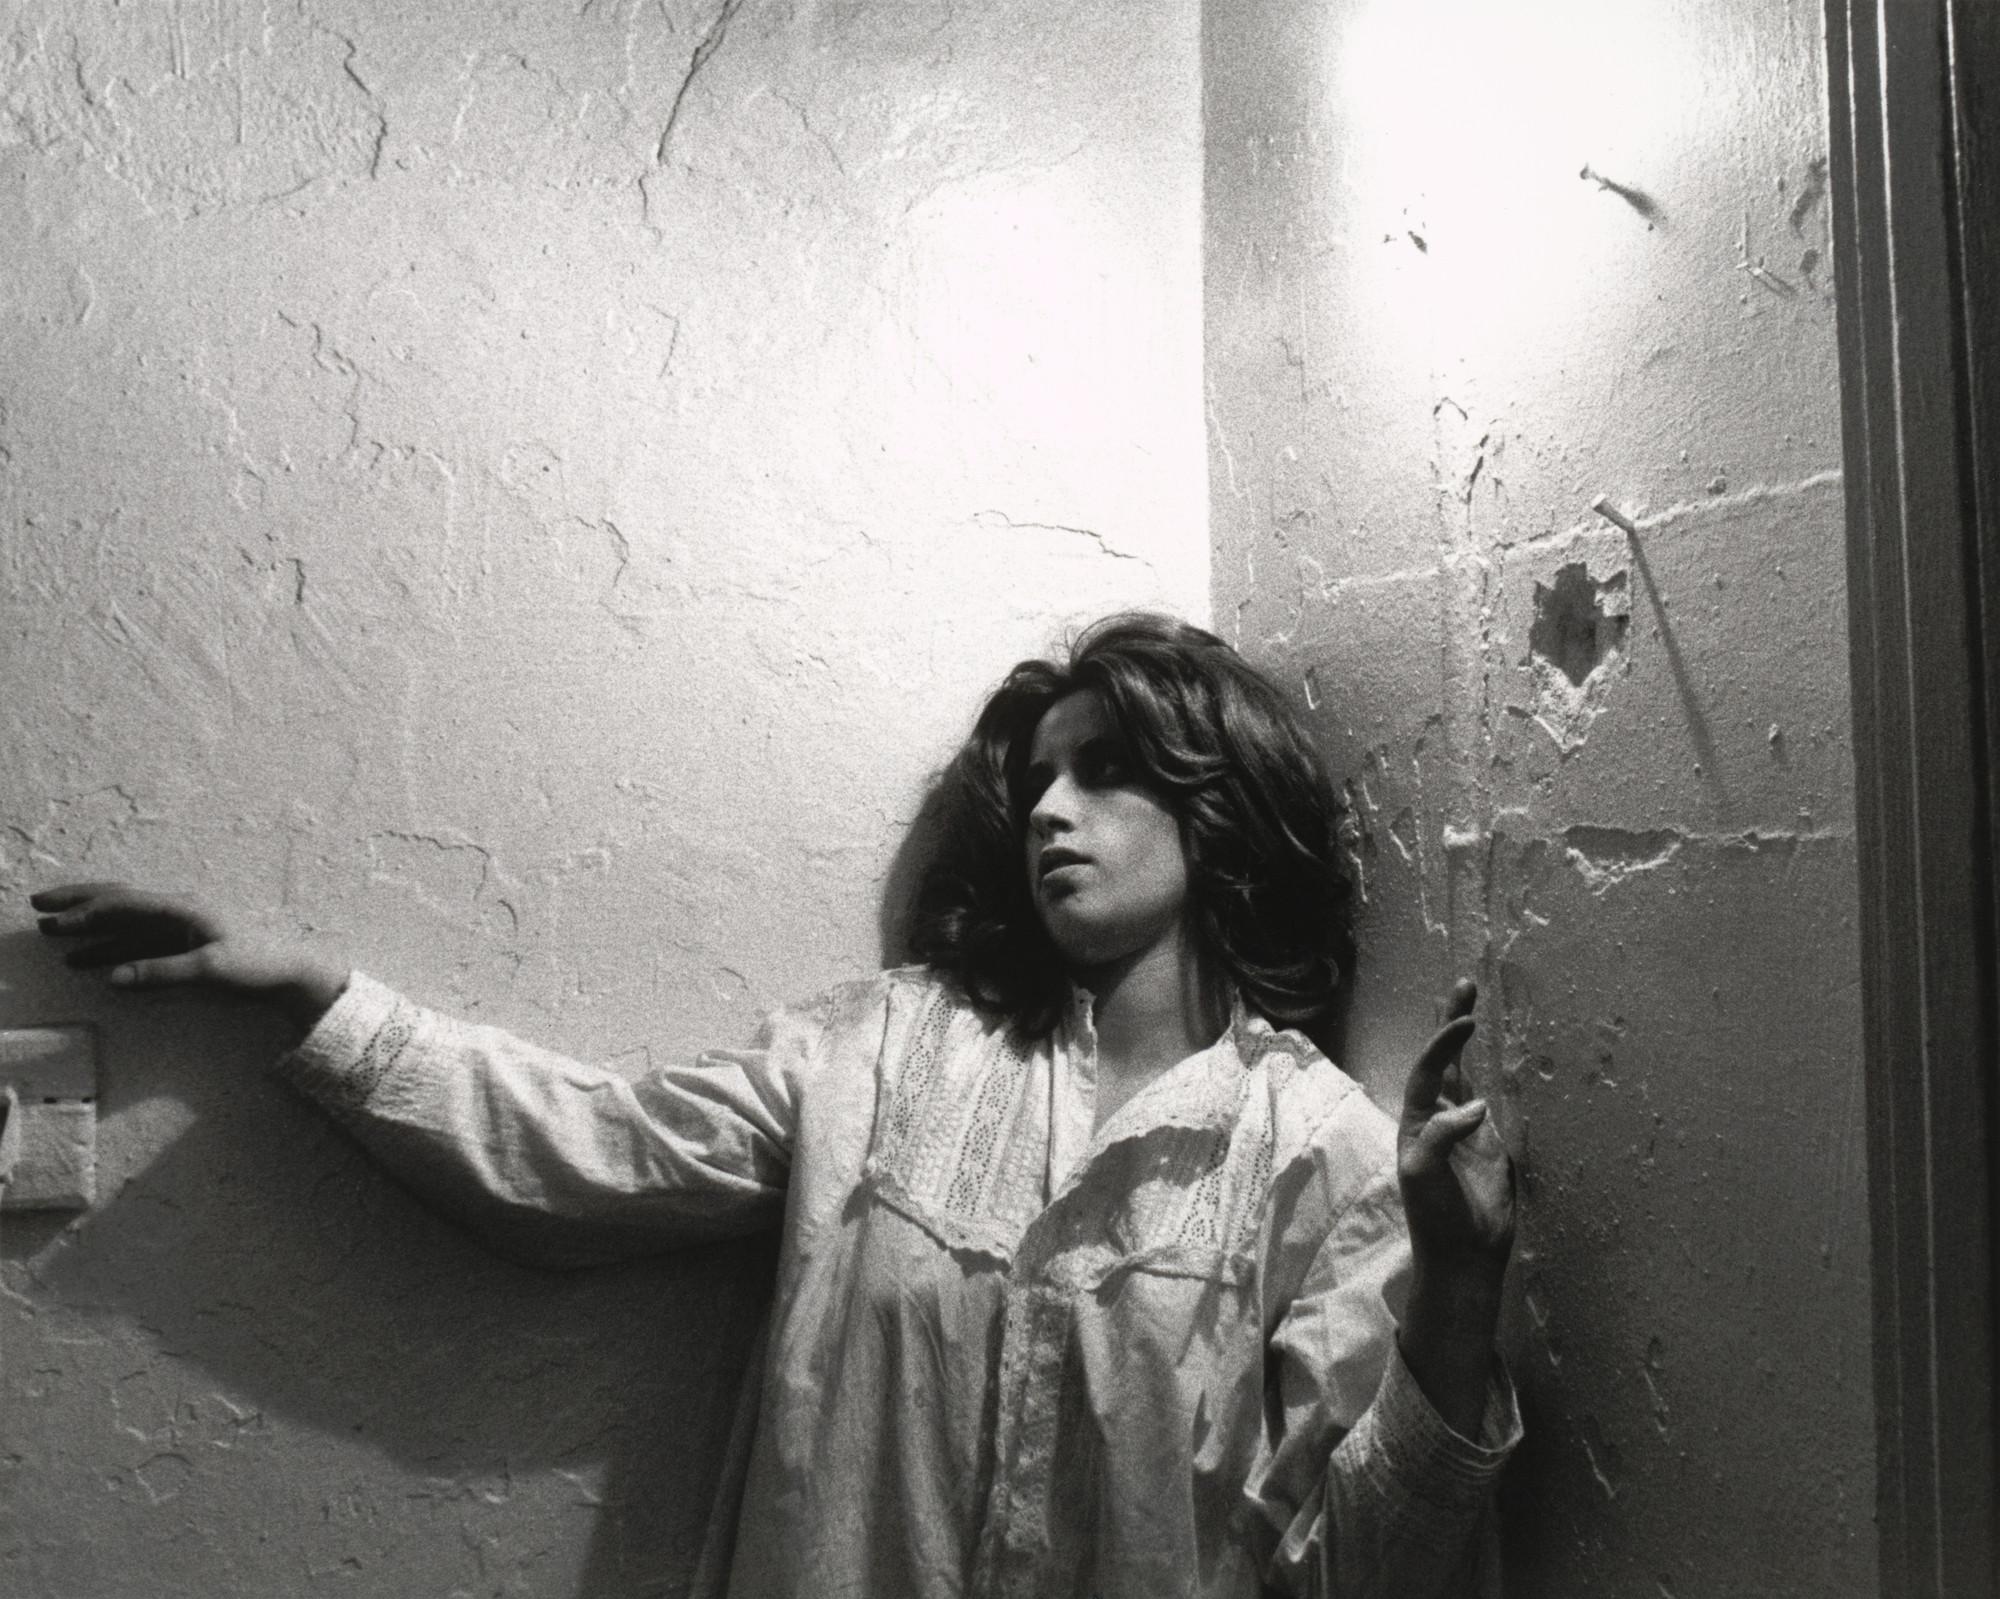 Cindy Sherman. Untitled Film Still #29. 1979 | MoMA